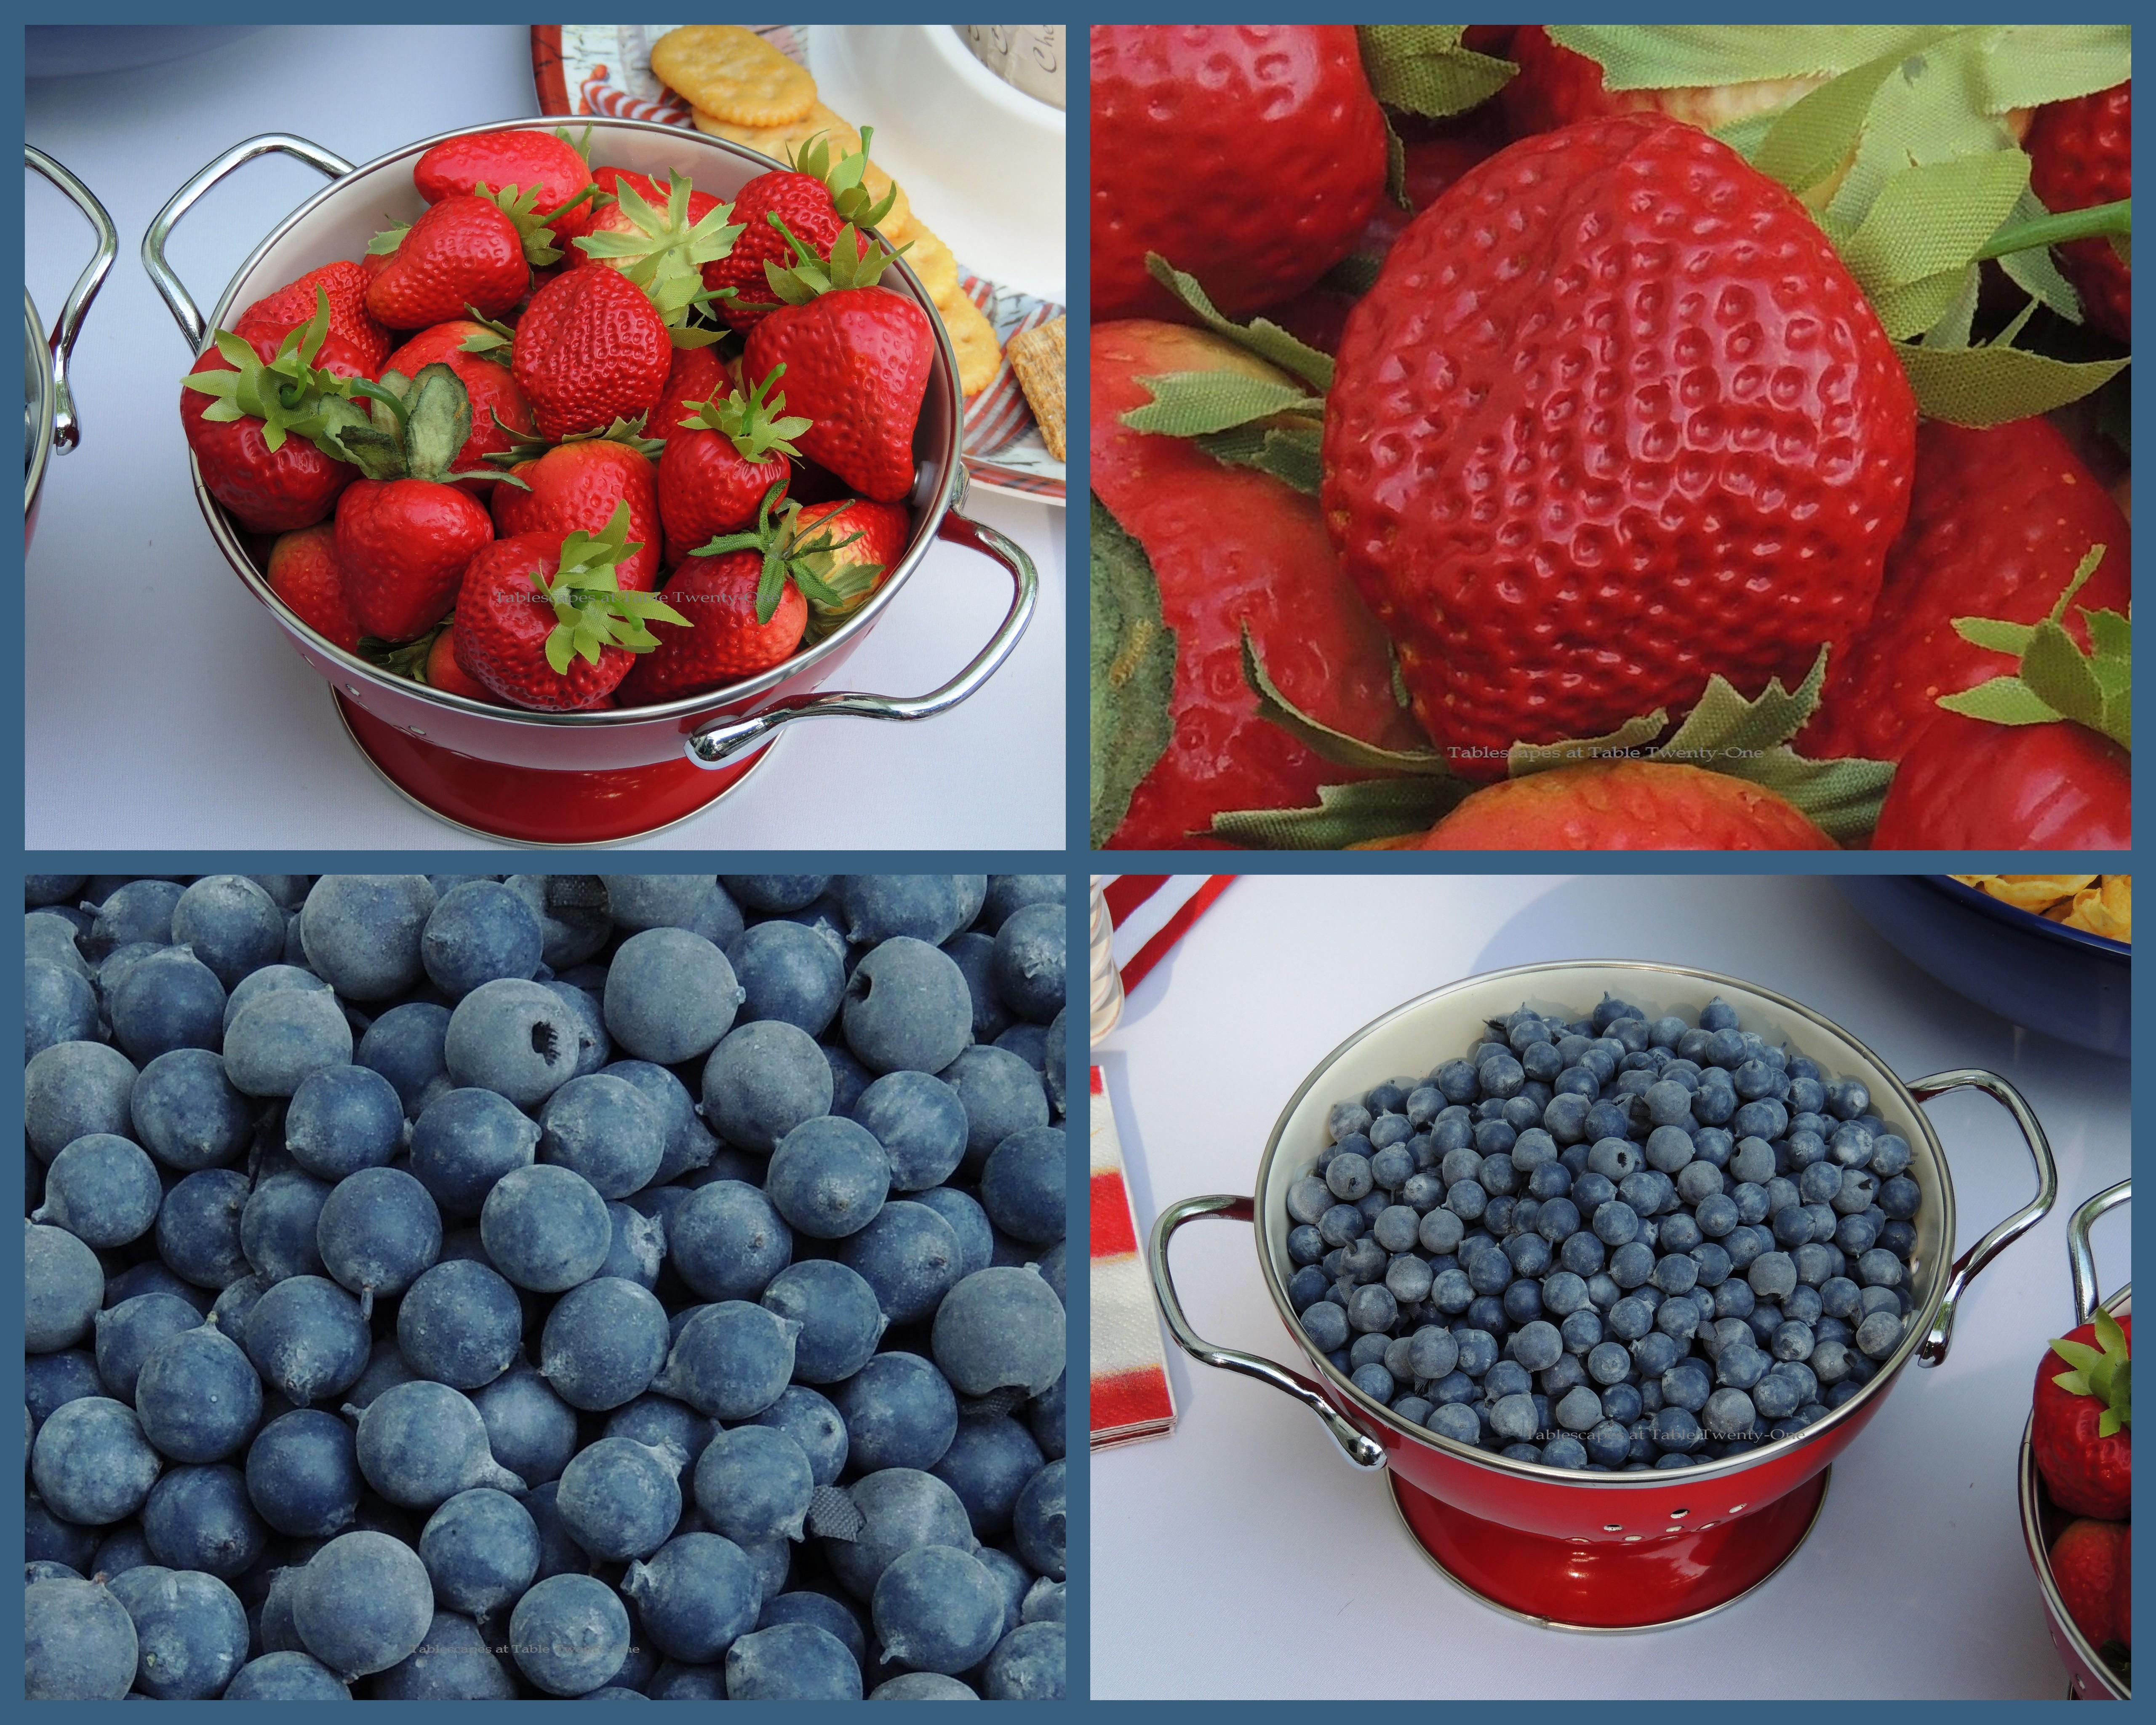 Tablescapes at Table Twenty-One, www.tabletwentyone.wordpress.com, 4th of July Coastal Style: strawberries & blueberries in red metal colanders